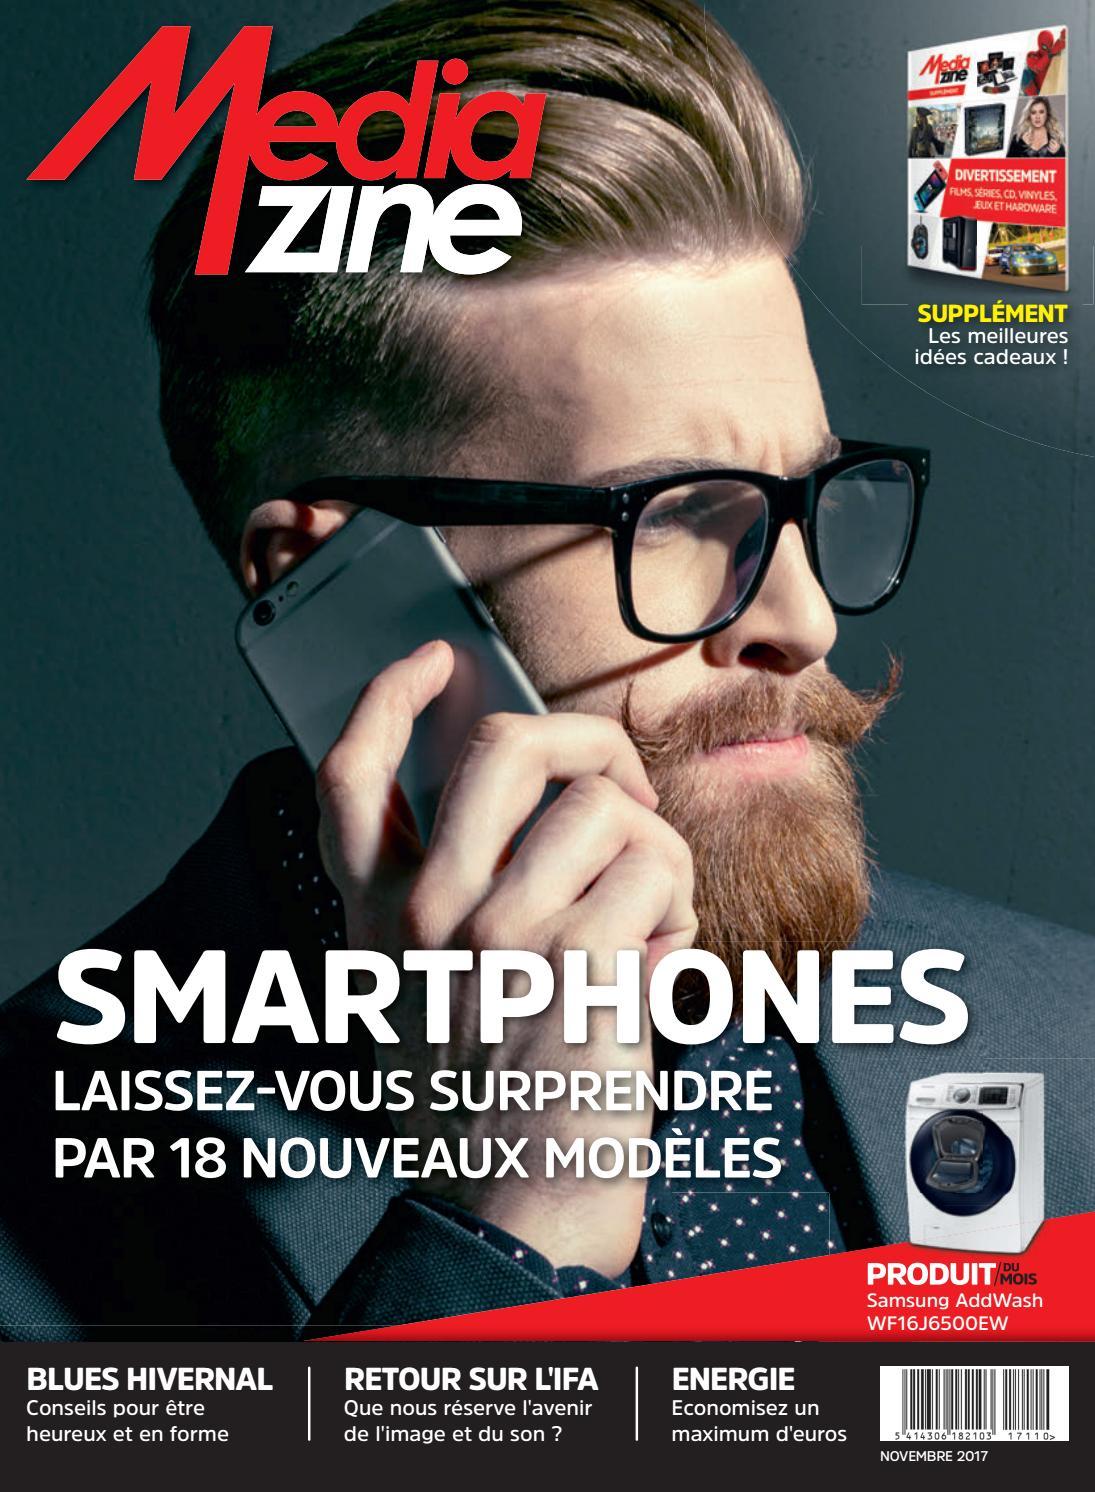 Mediazine Belgique Novembre 2017 by Mediazine België Belgique - issuu 4fd161097979